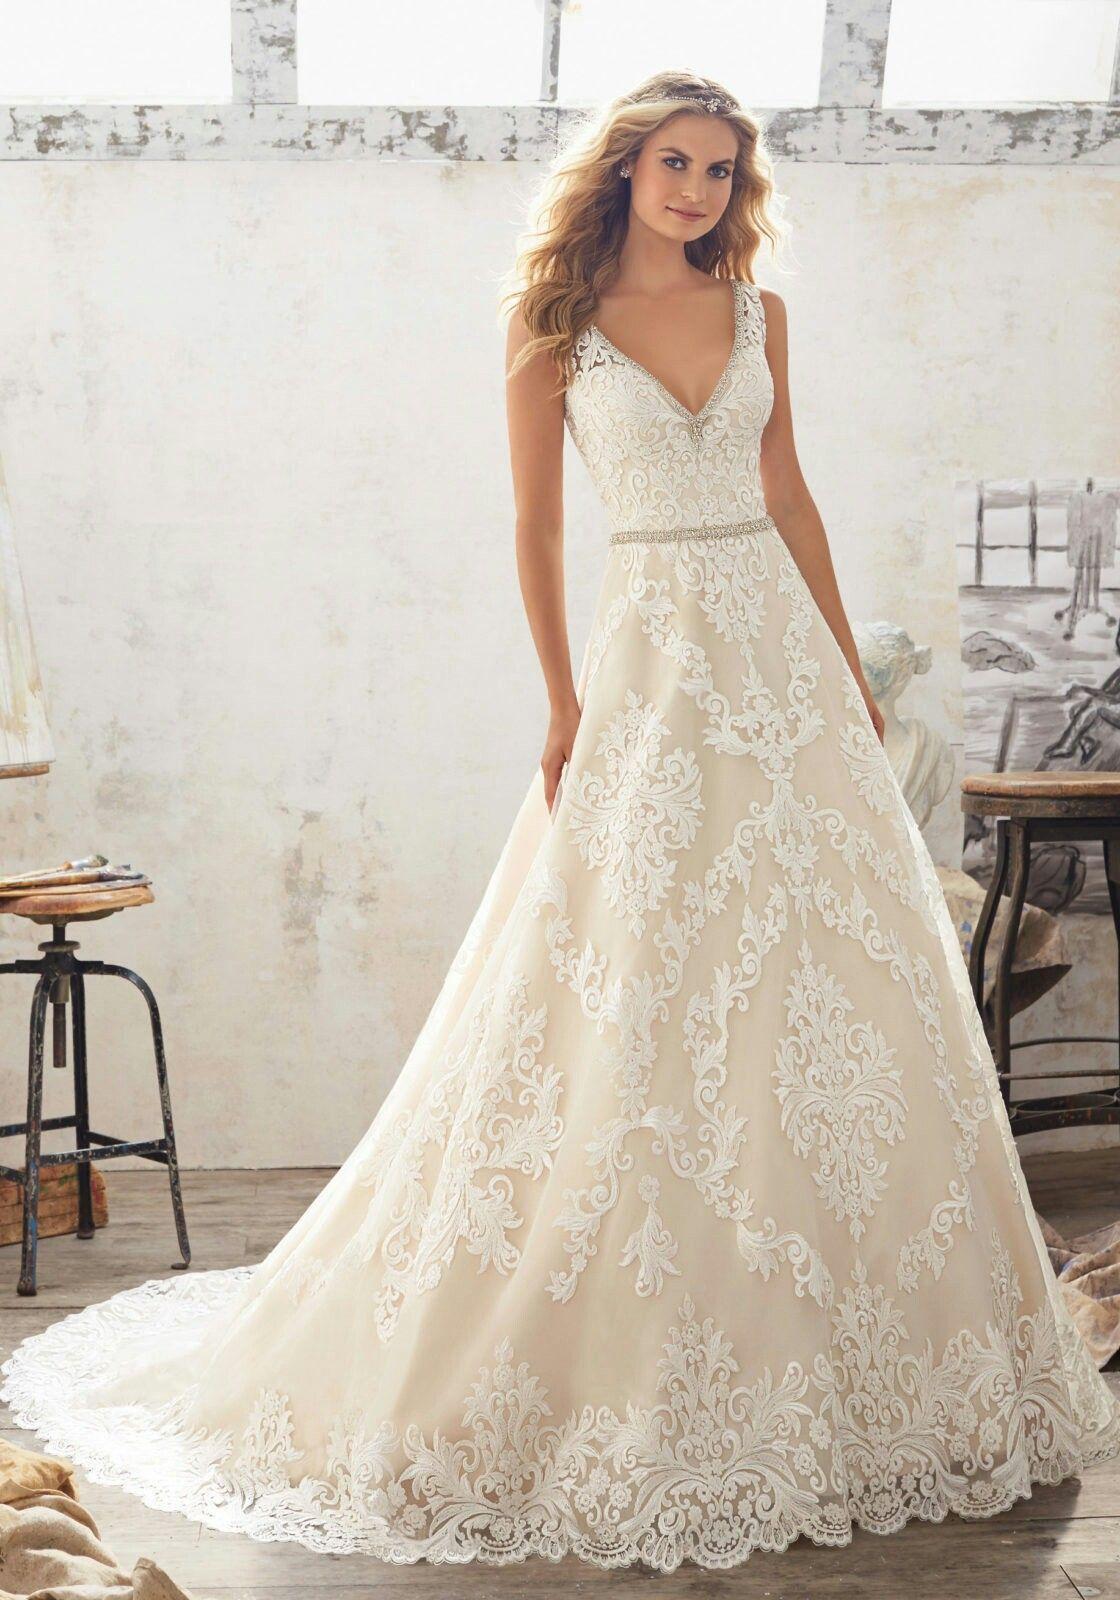 Morgan Wedding Dress by Madeline Gardener   Gelin   Pinterest